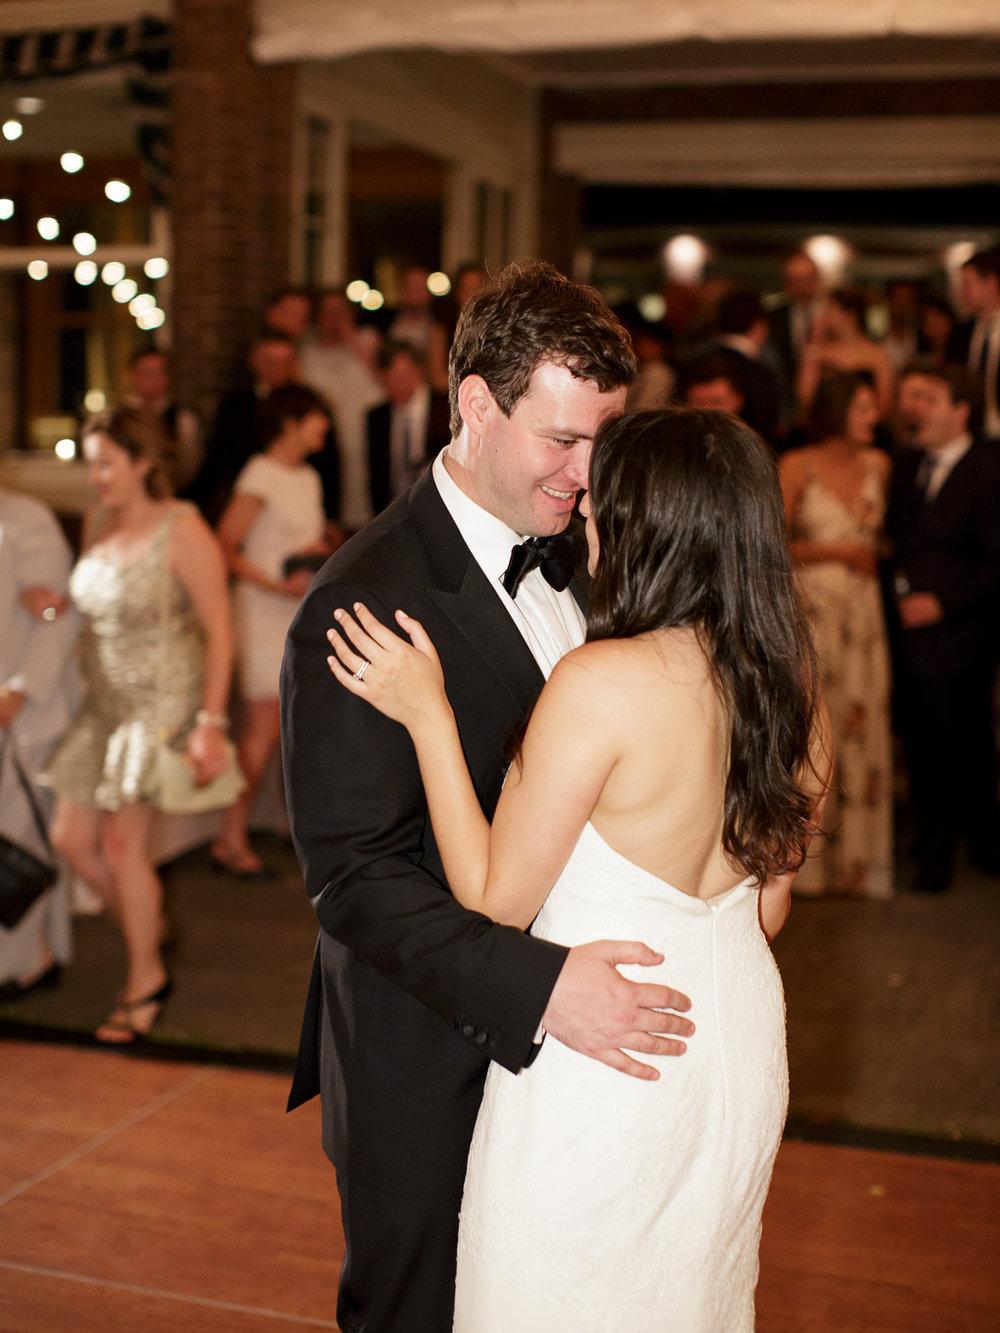 0061-Nadia-Chris-Married-When He Founf Her-Toronto Golf Club.jpg